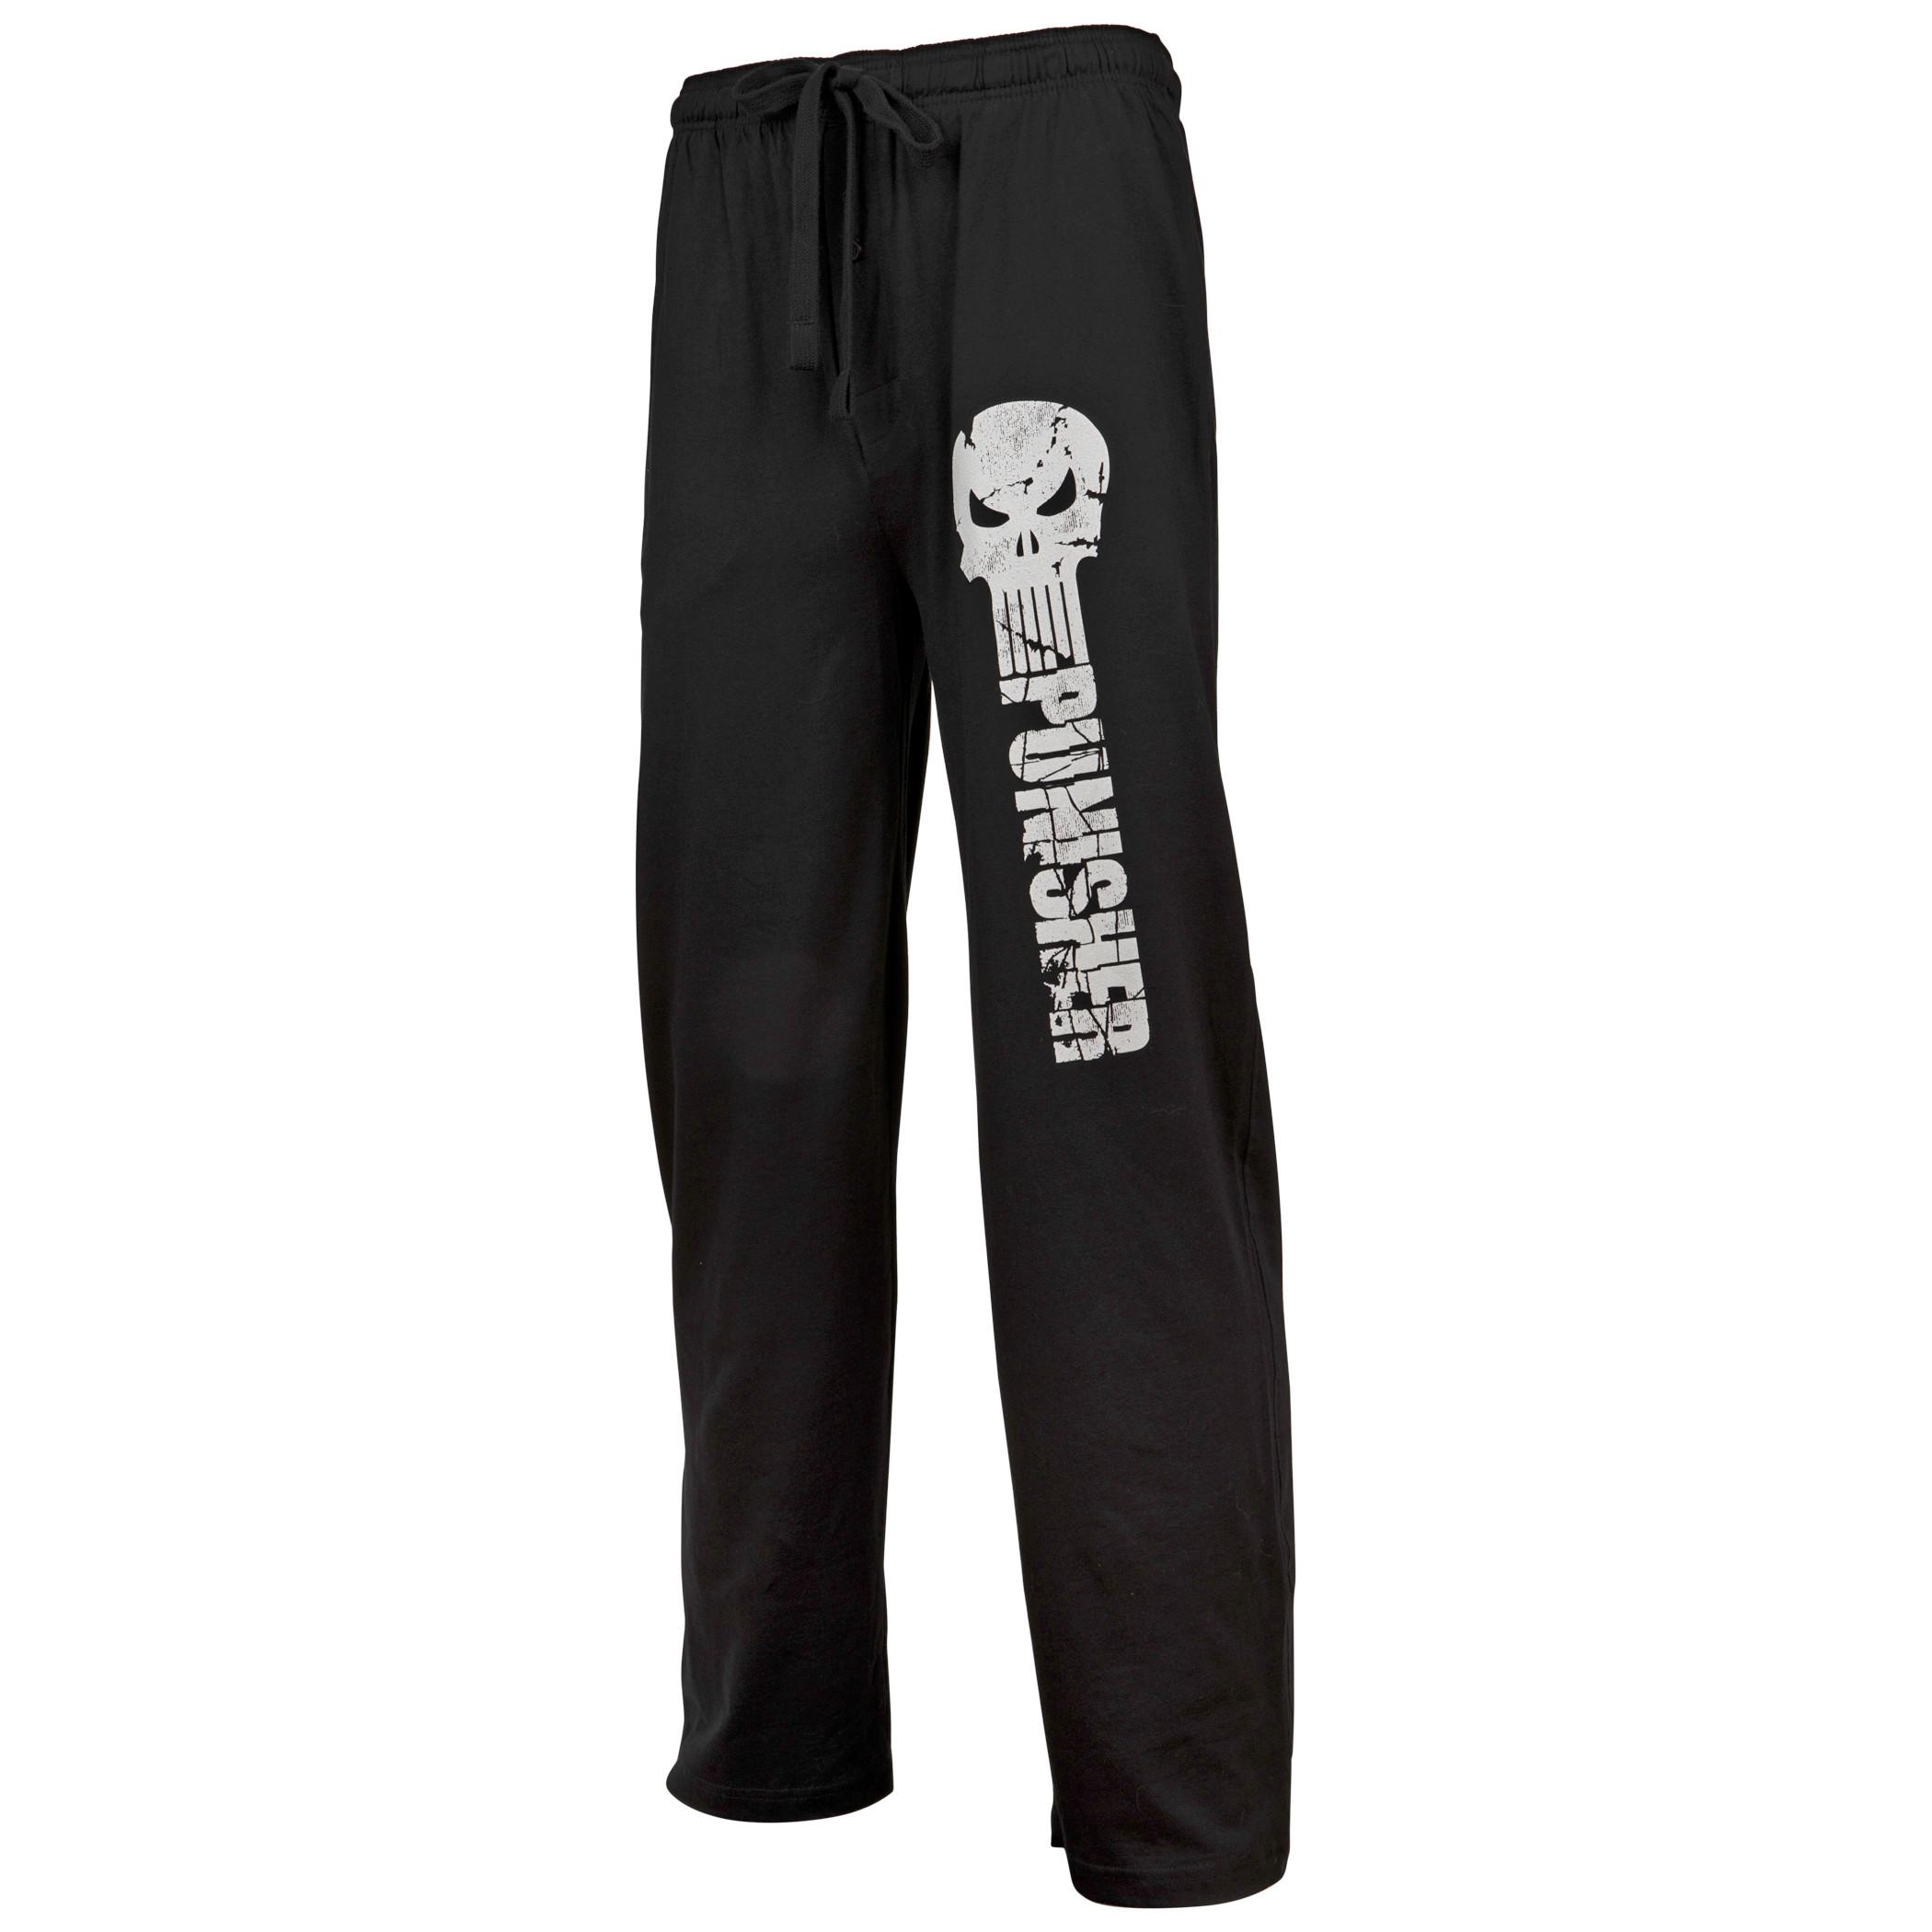 Marvel's Punisher Skull and Text Unisex Sleep Pants